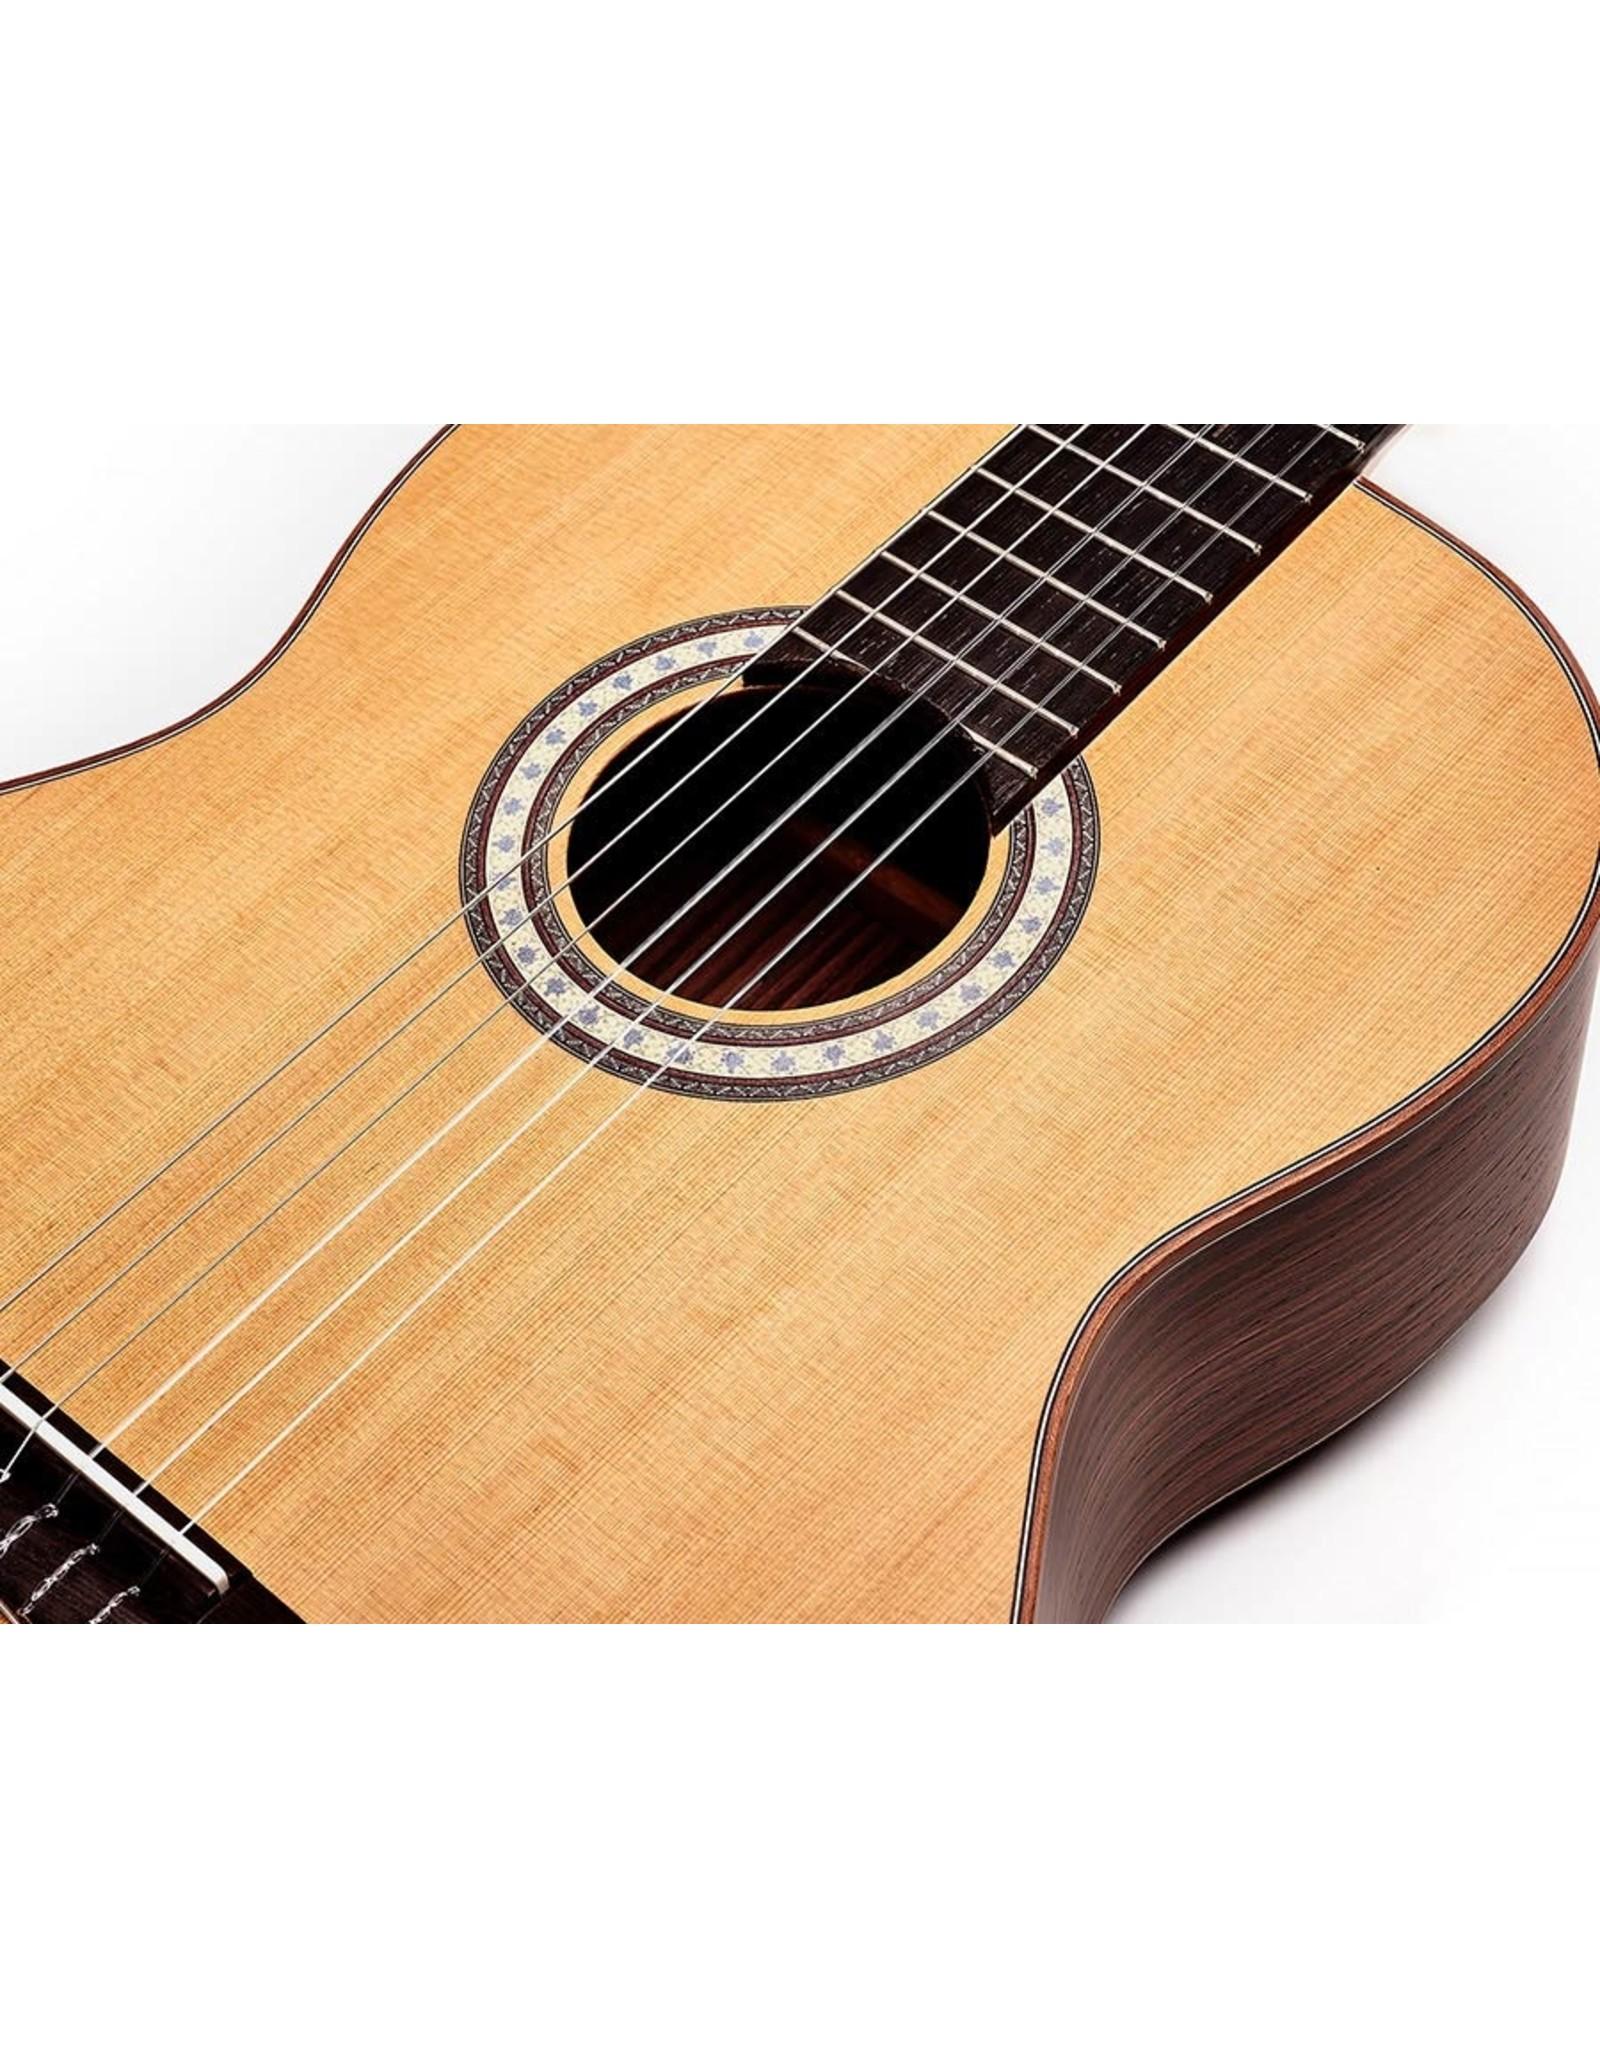 Esteve Esteve Jucar-CD Organic Series Organic Series klassieke gitaar